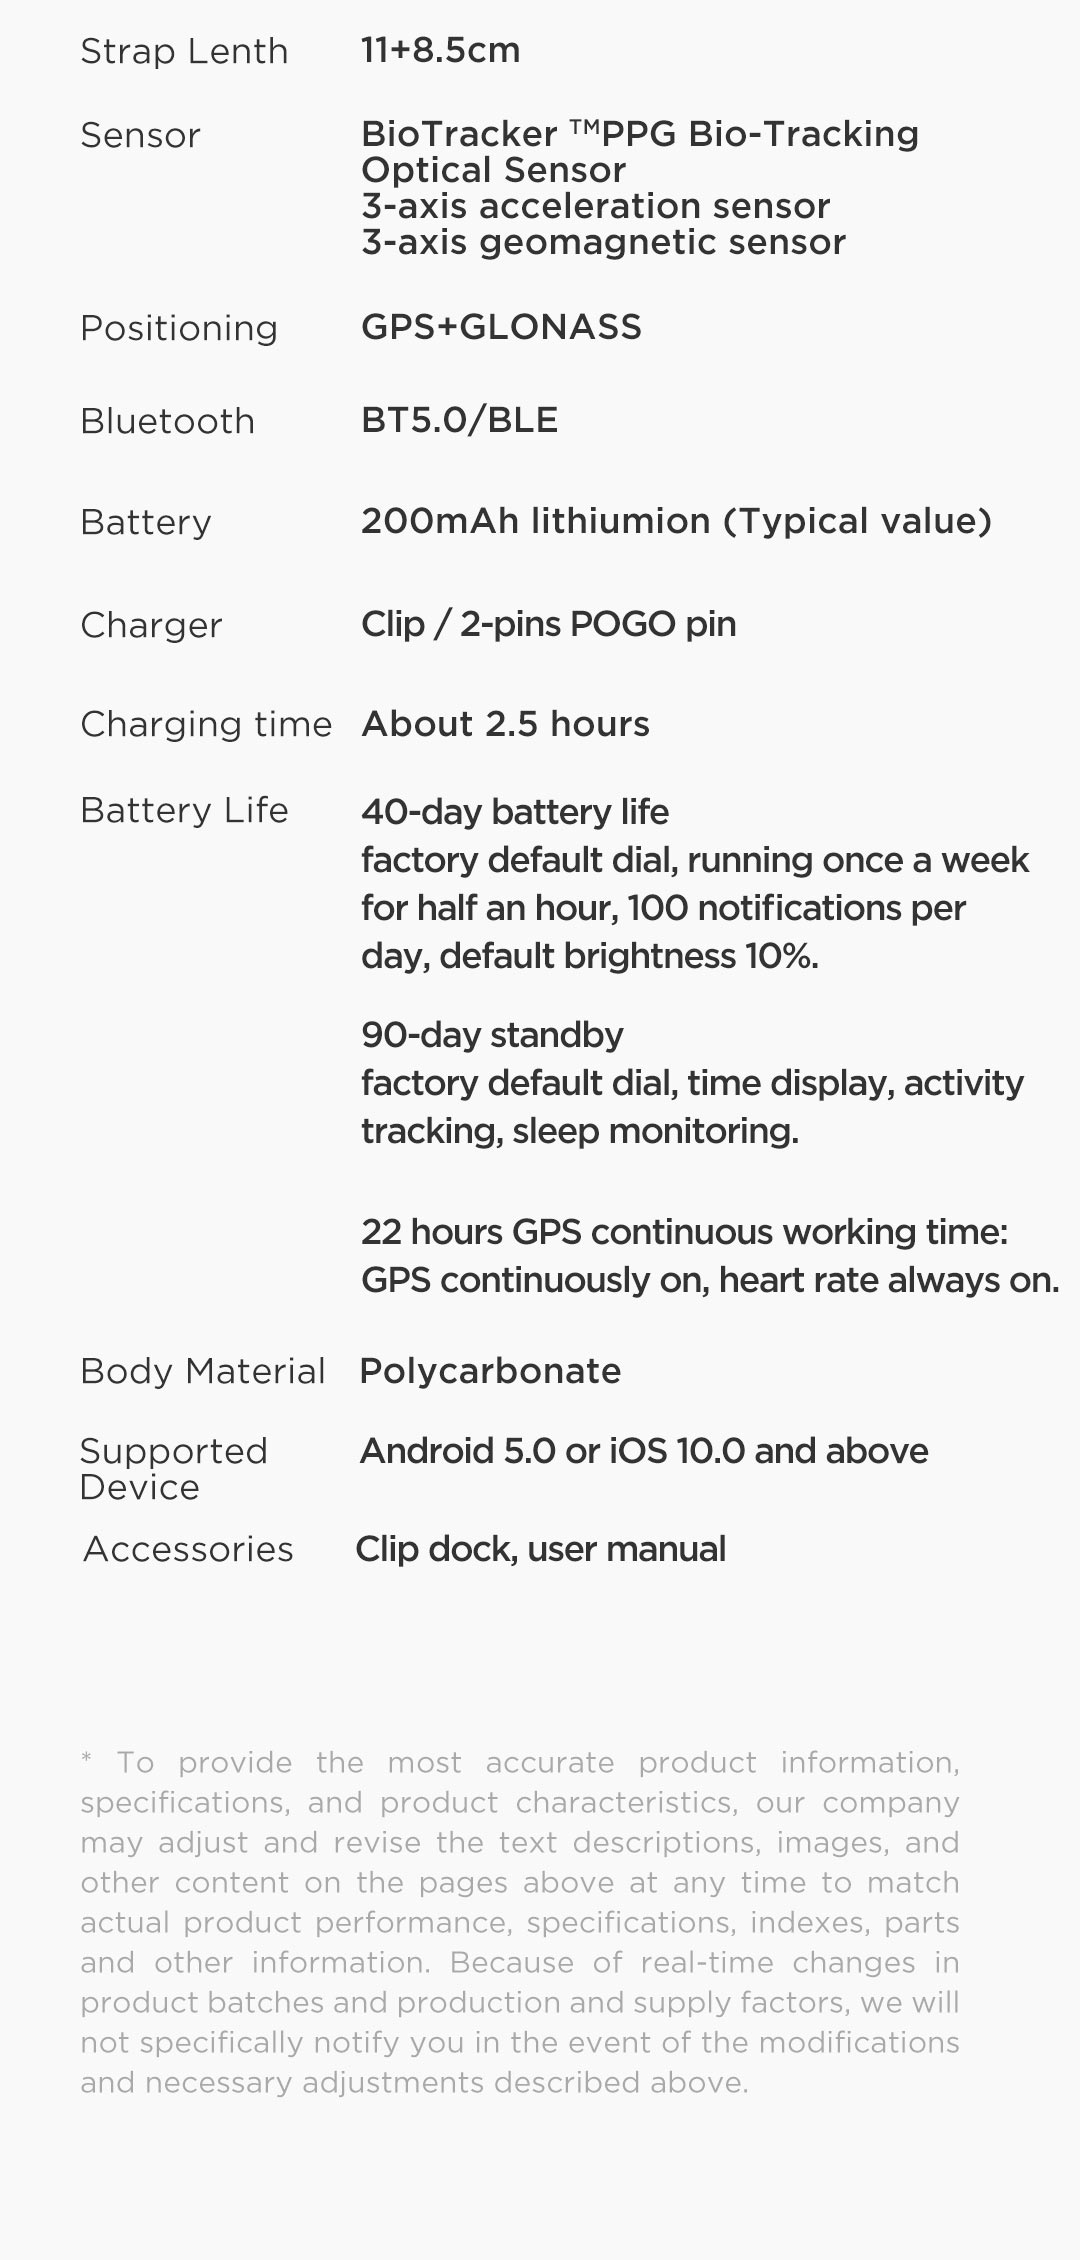 Hd6c8ec979cf54d4995389b89bea69f3ct In Stock 2020 Global Amazfit Bip S Smartwatch 5ATM waterproof built in GPS GLONASS Smart Watch for Android iOS Phone